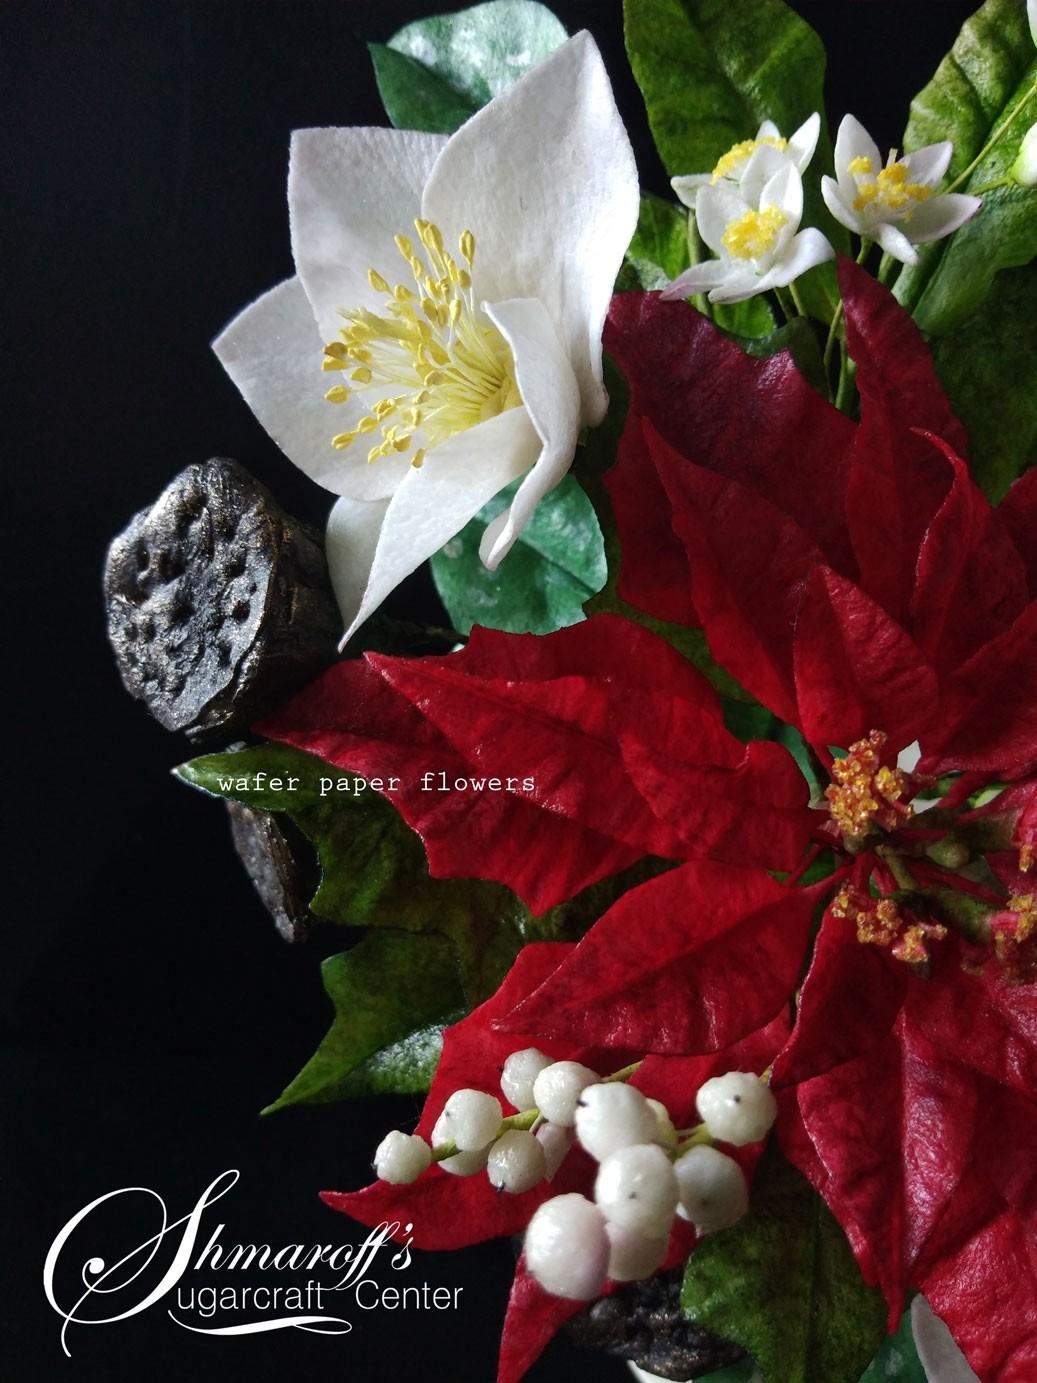 Gastworkshop Petya Shmarova - Jingle Bells